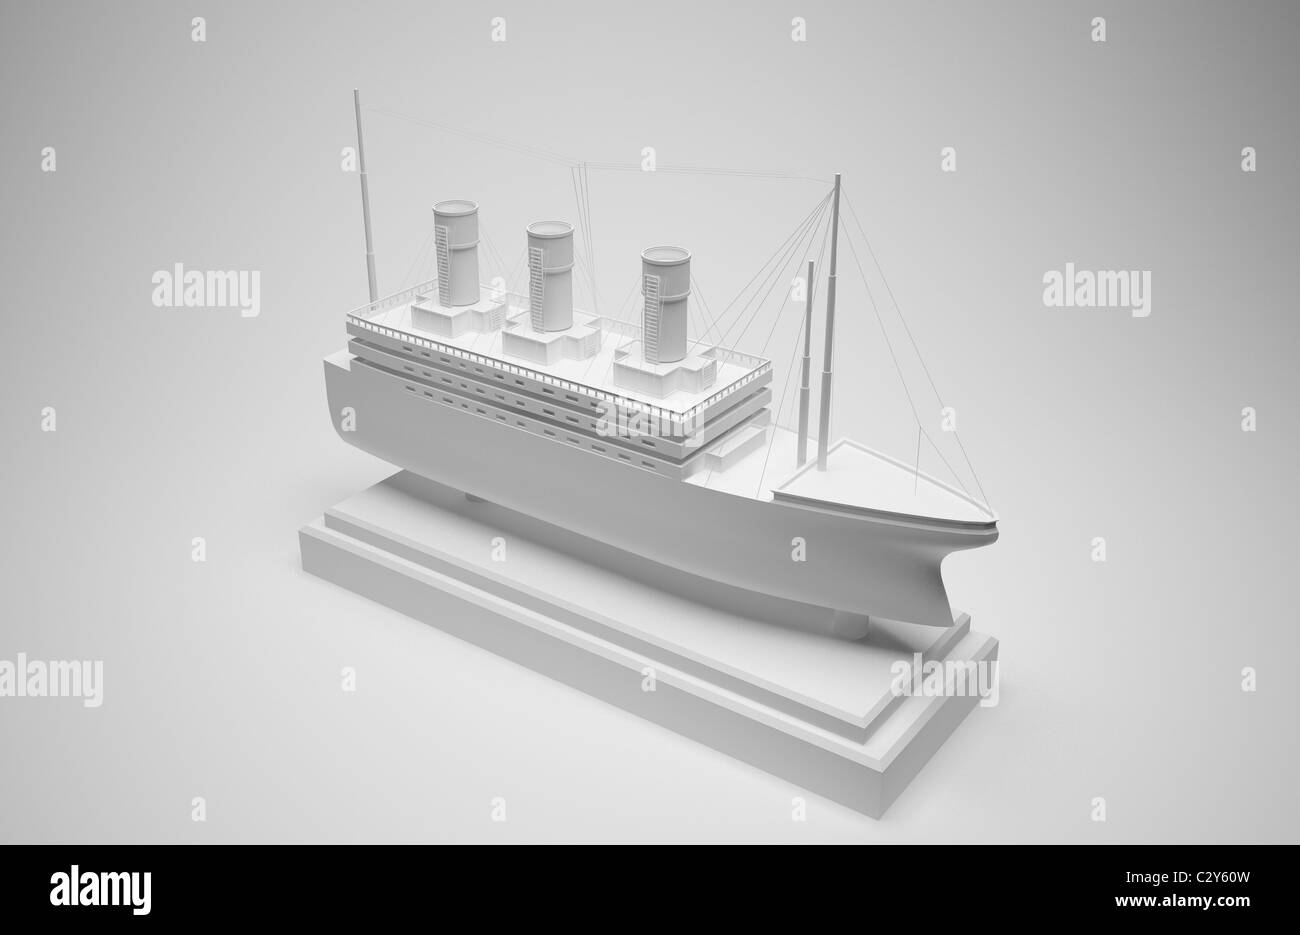 papercraft ship Stock Photo: 36247481 - Alamy